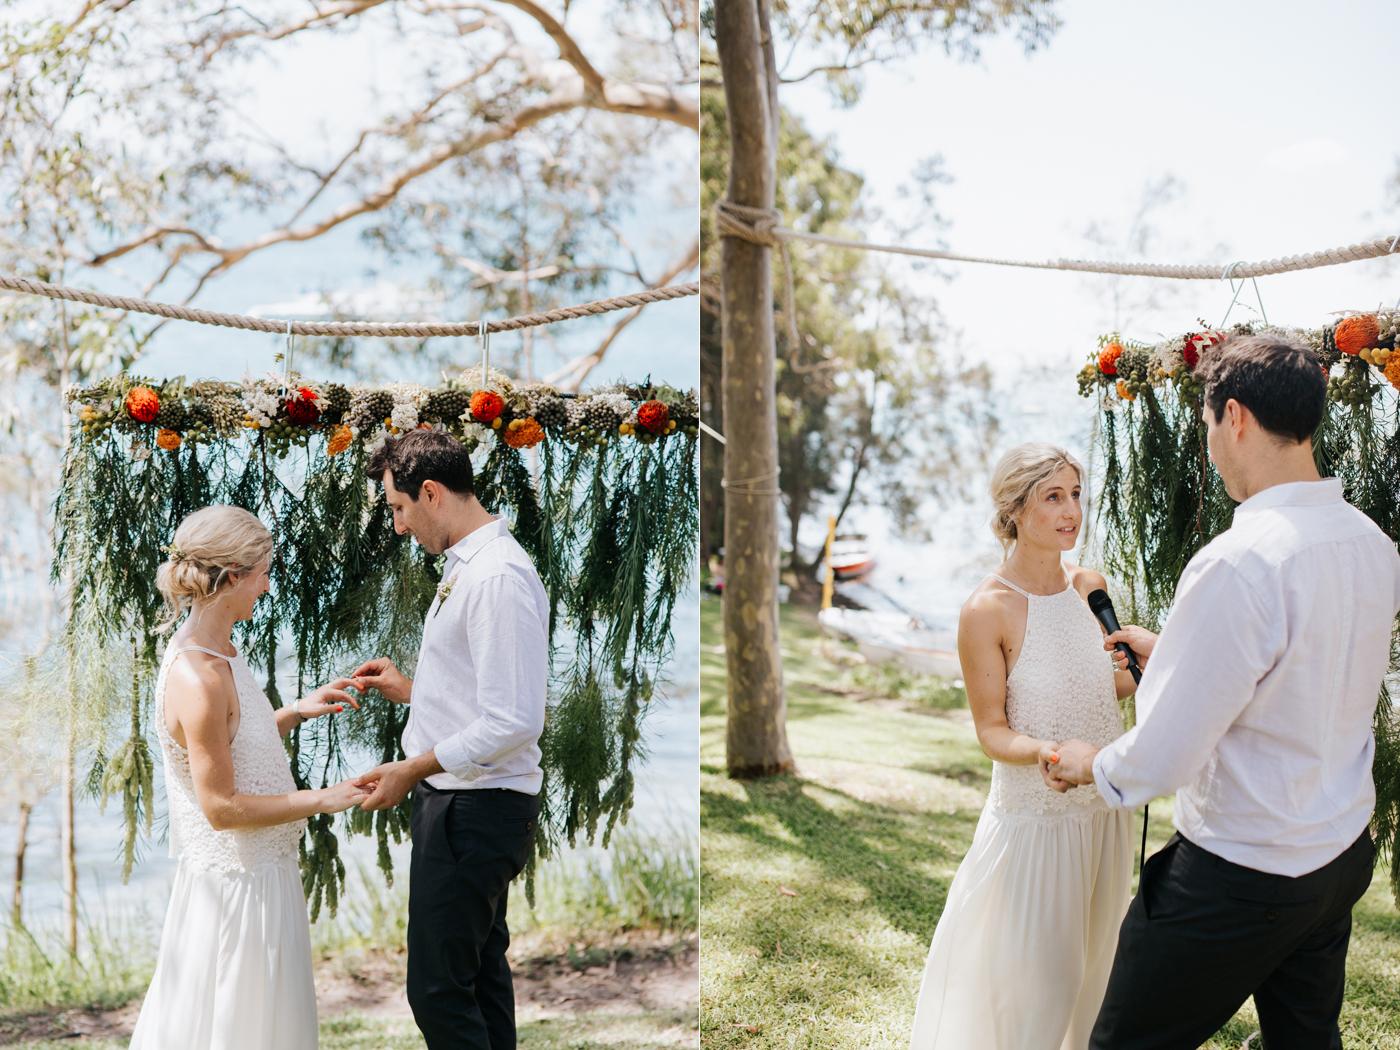 Emma & Ben - Lake Macquarie - Hunter Valley Wedding - Samantha Heather Photography-111.jpg